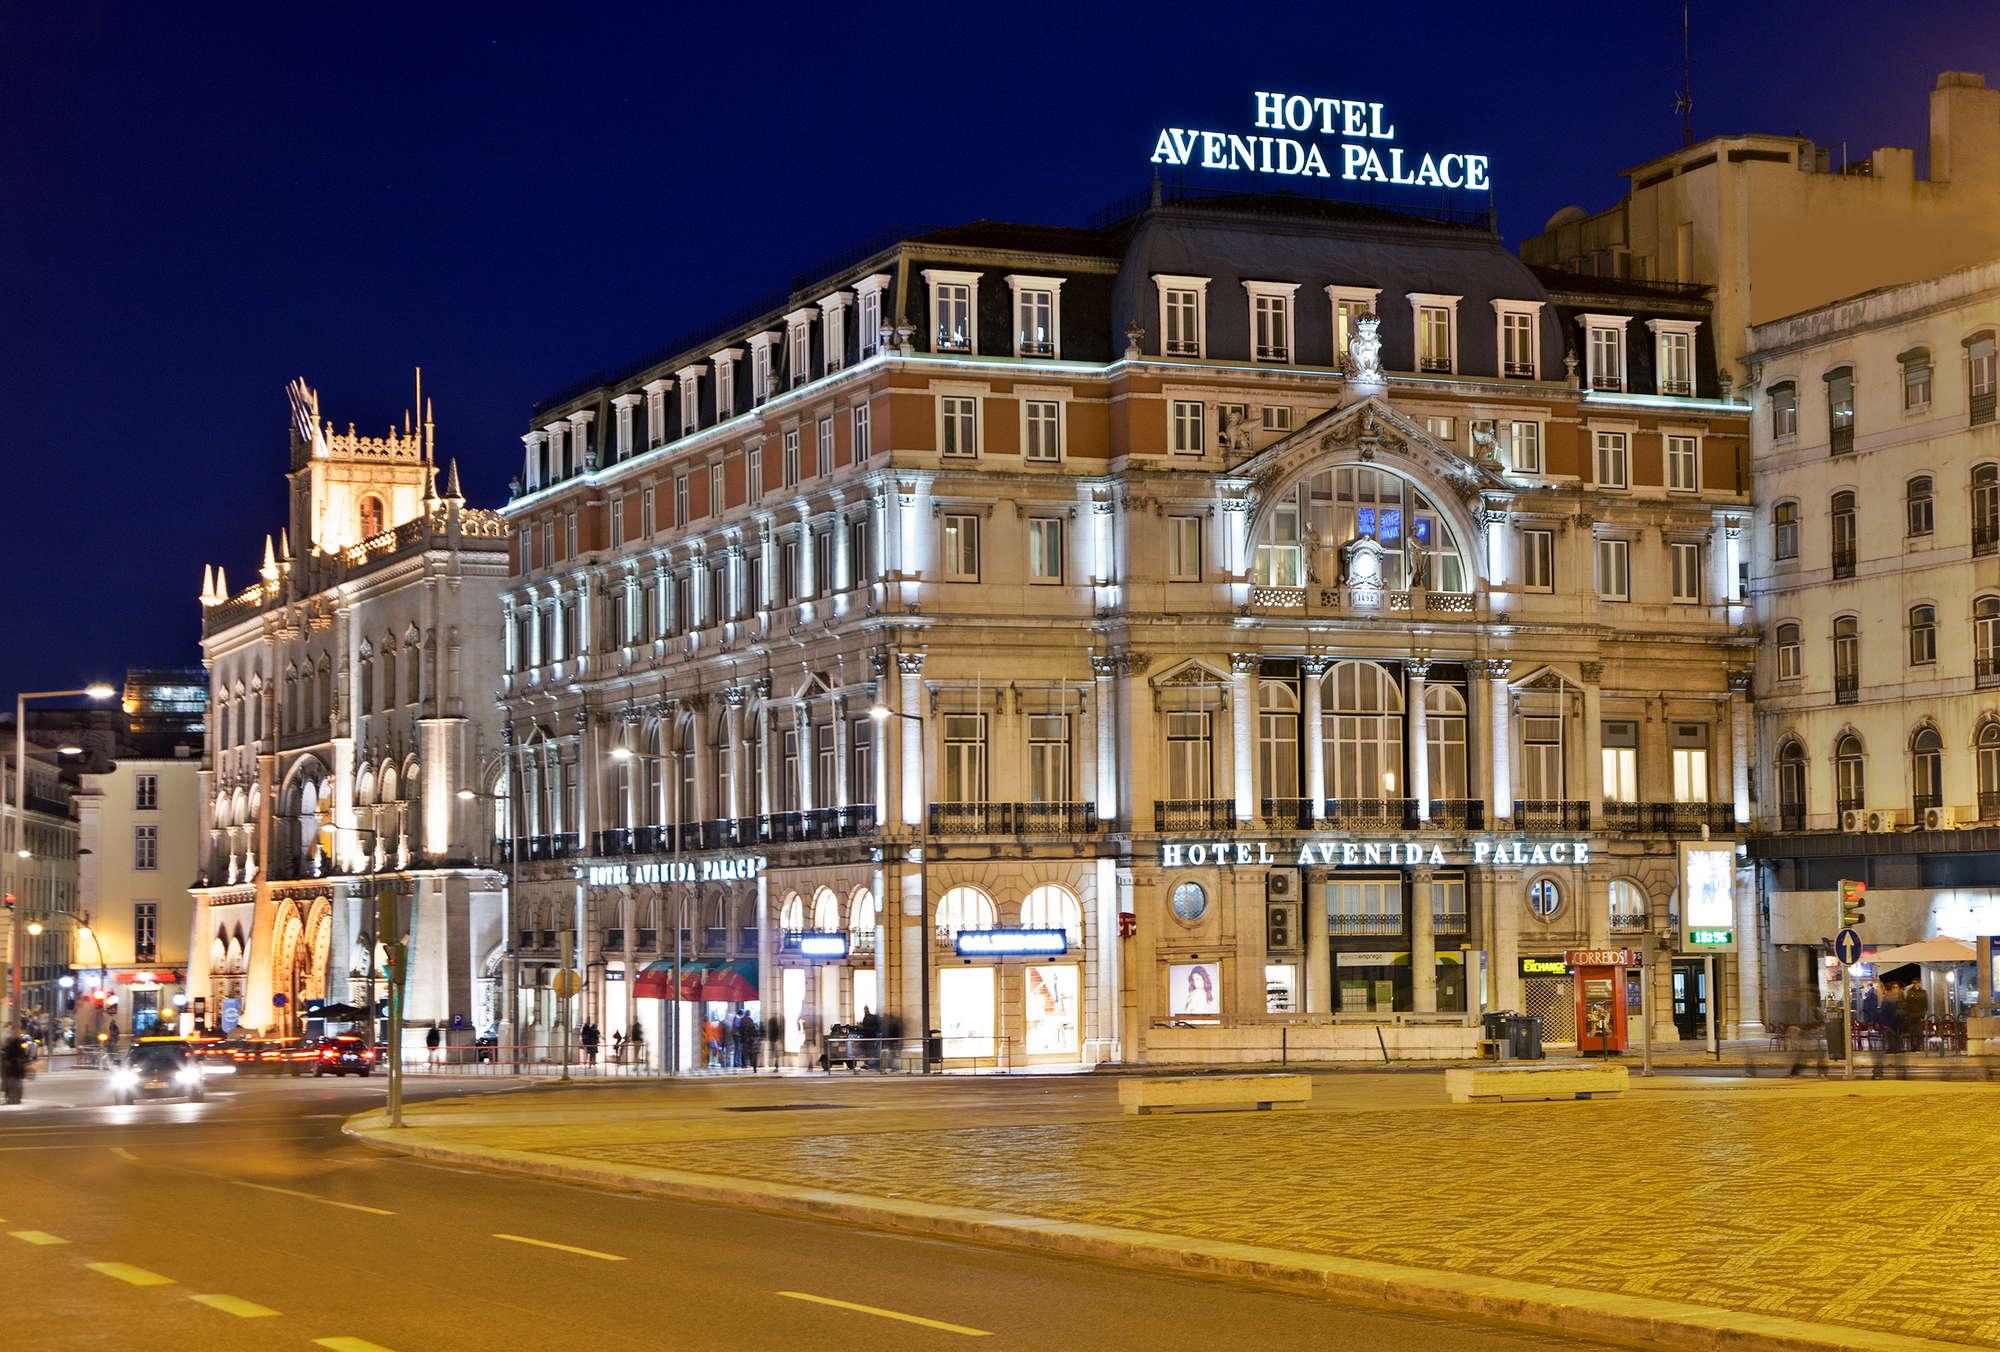 avenida palace expert review fodor s travel. Black Bedroom Furniture Sets. Home Design Ideas